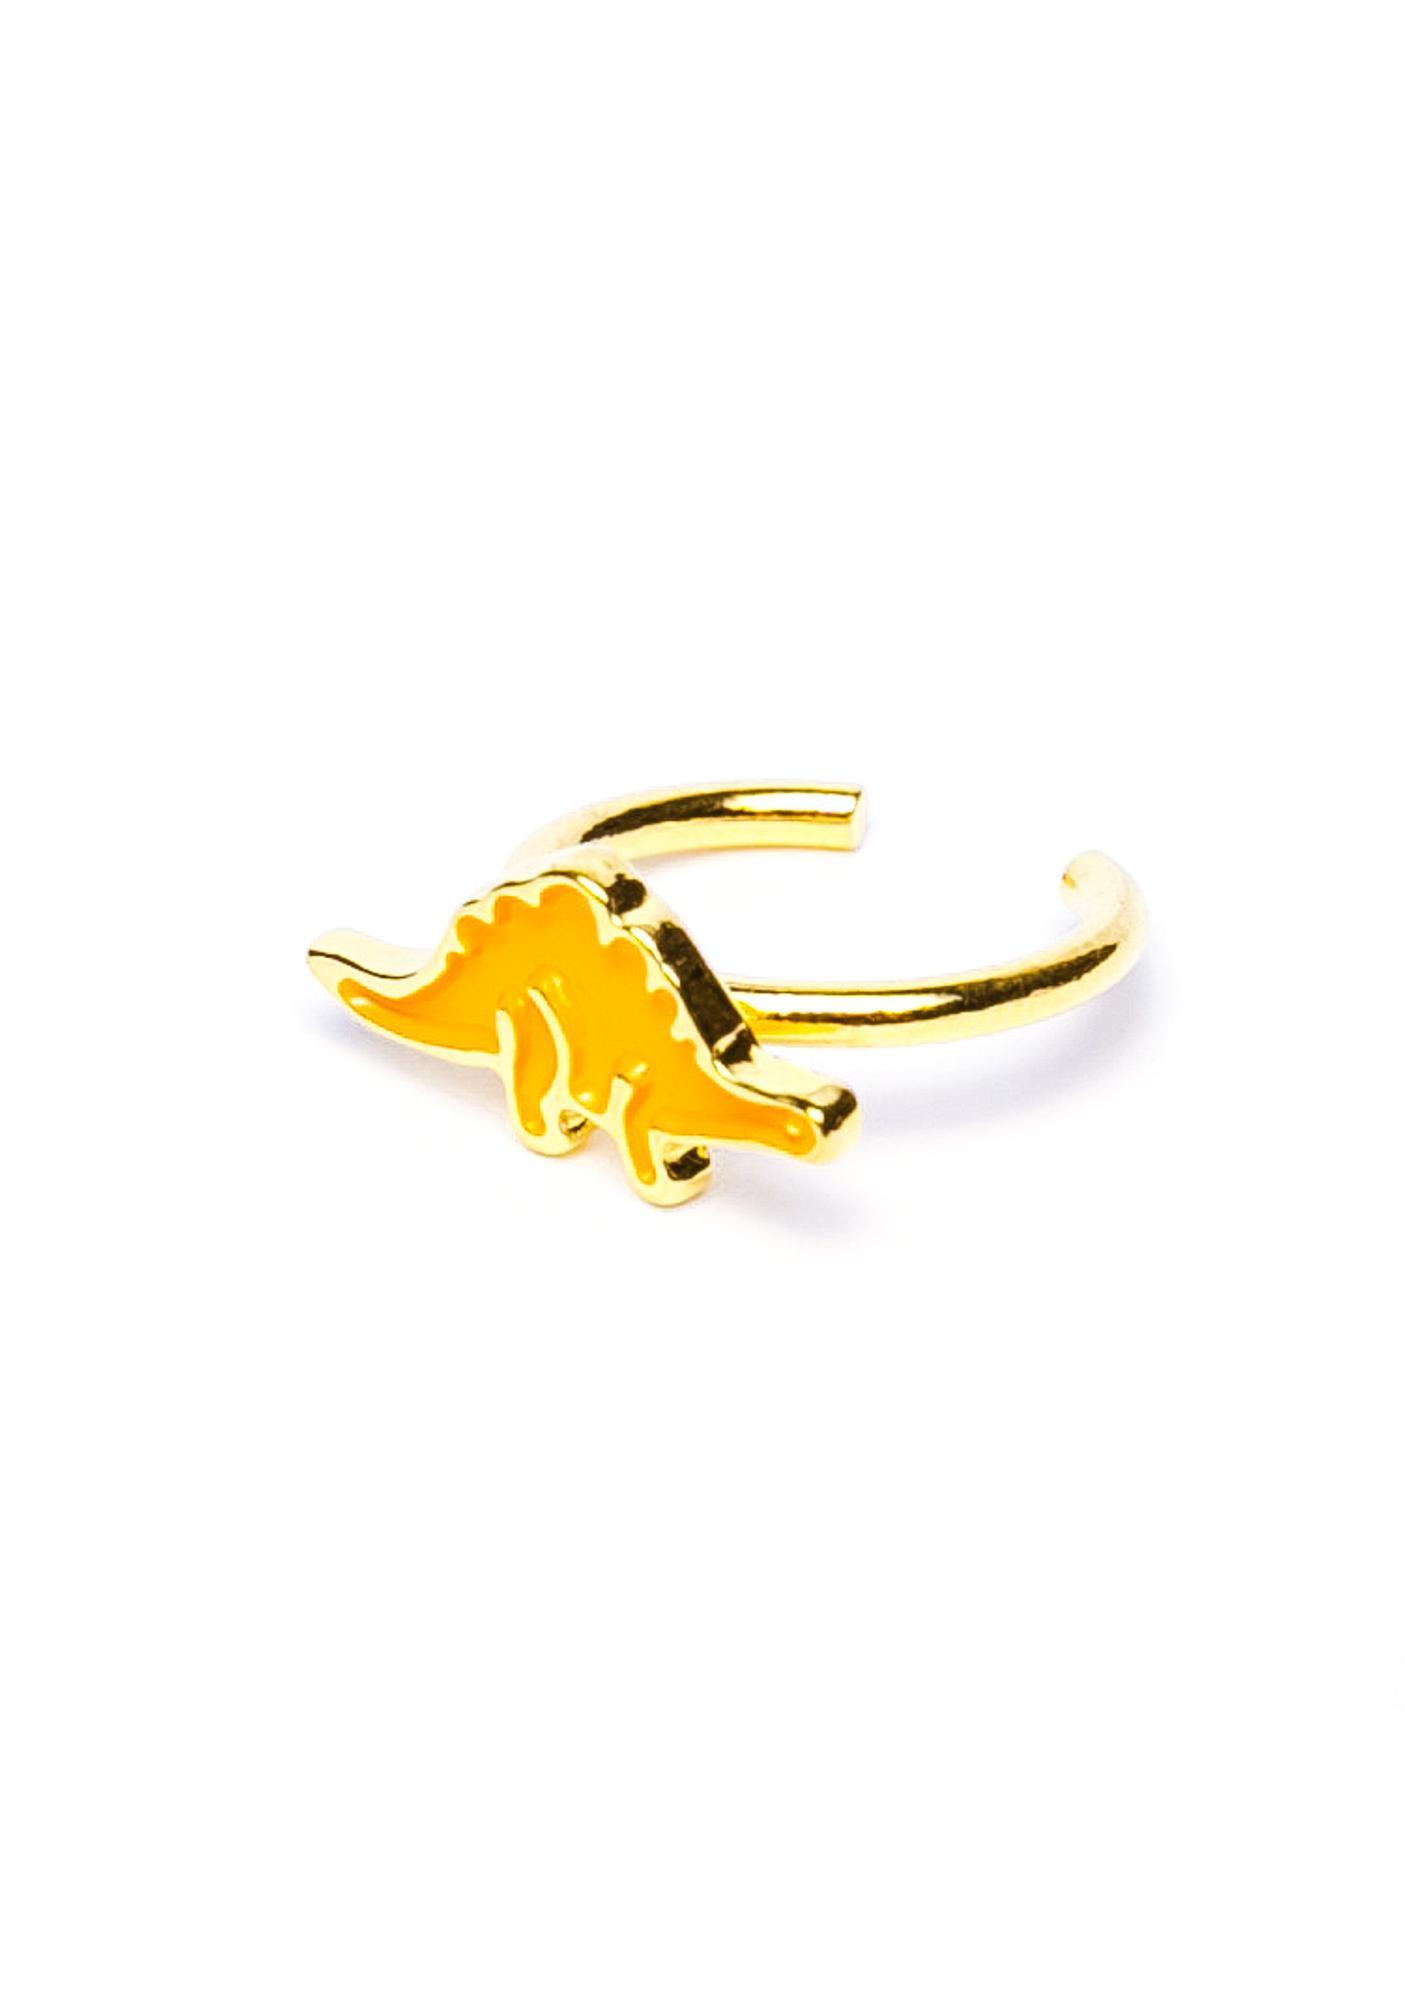 Joyrich x Giza Dinosaur Stegosaurus Micro Fingertip Ring